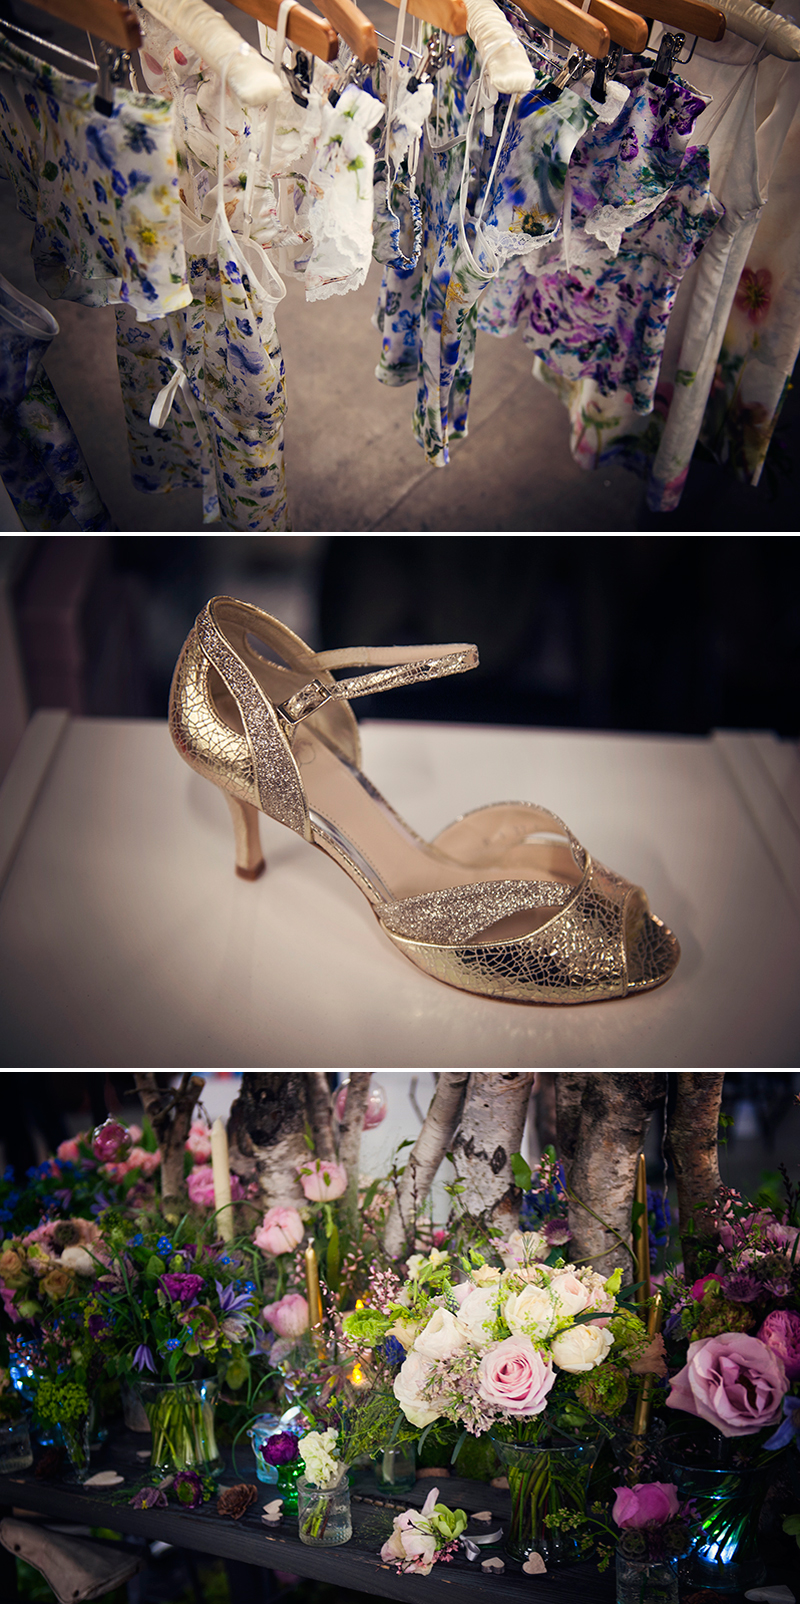 a-guide-to-wedding-fairs-wedding-planning-coco-wedding-venues-002